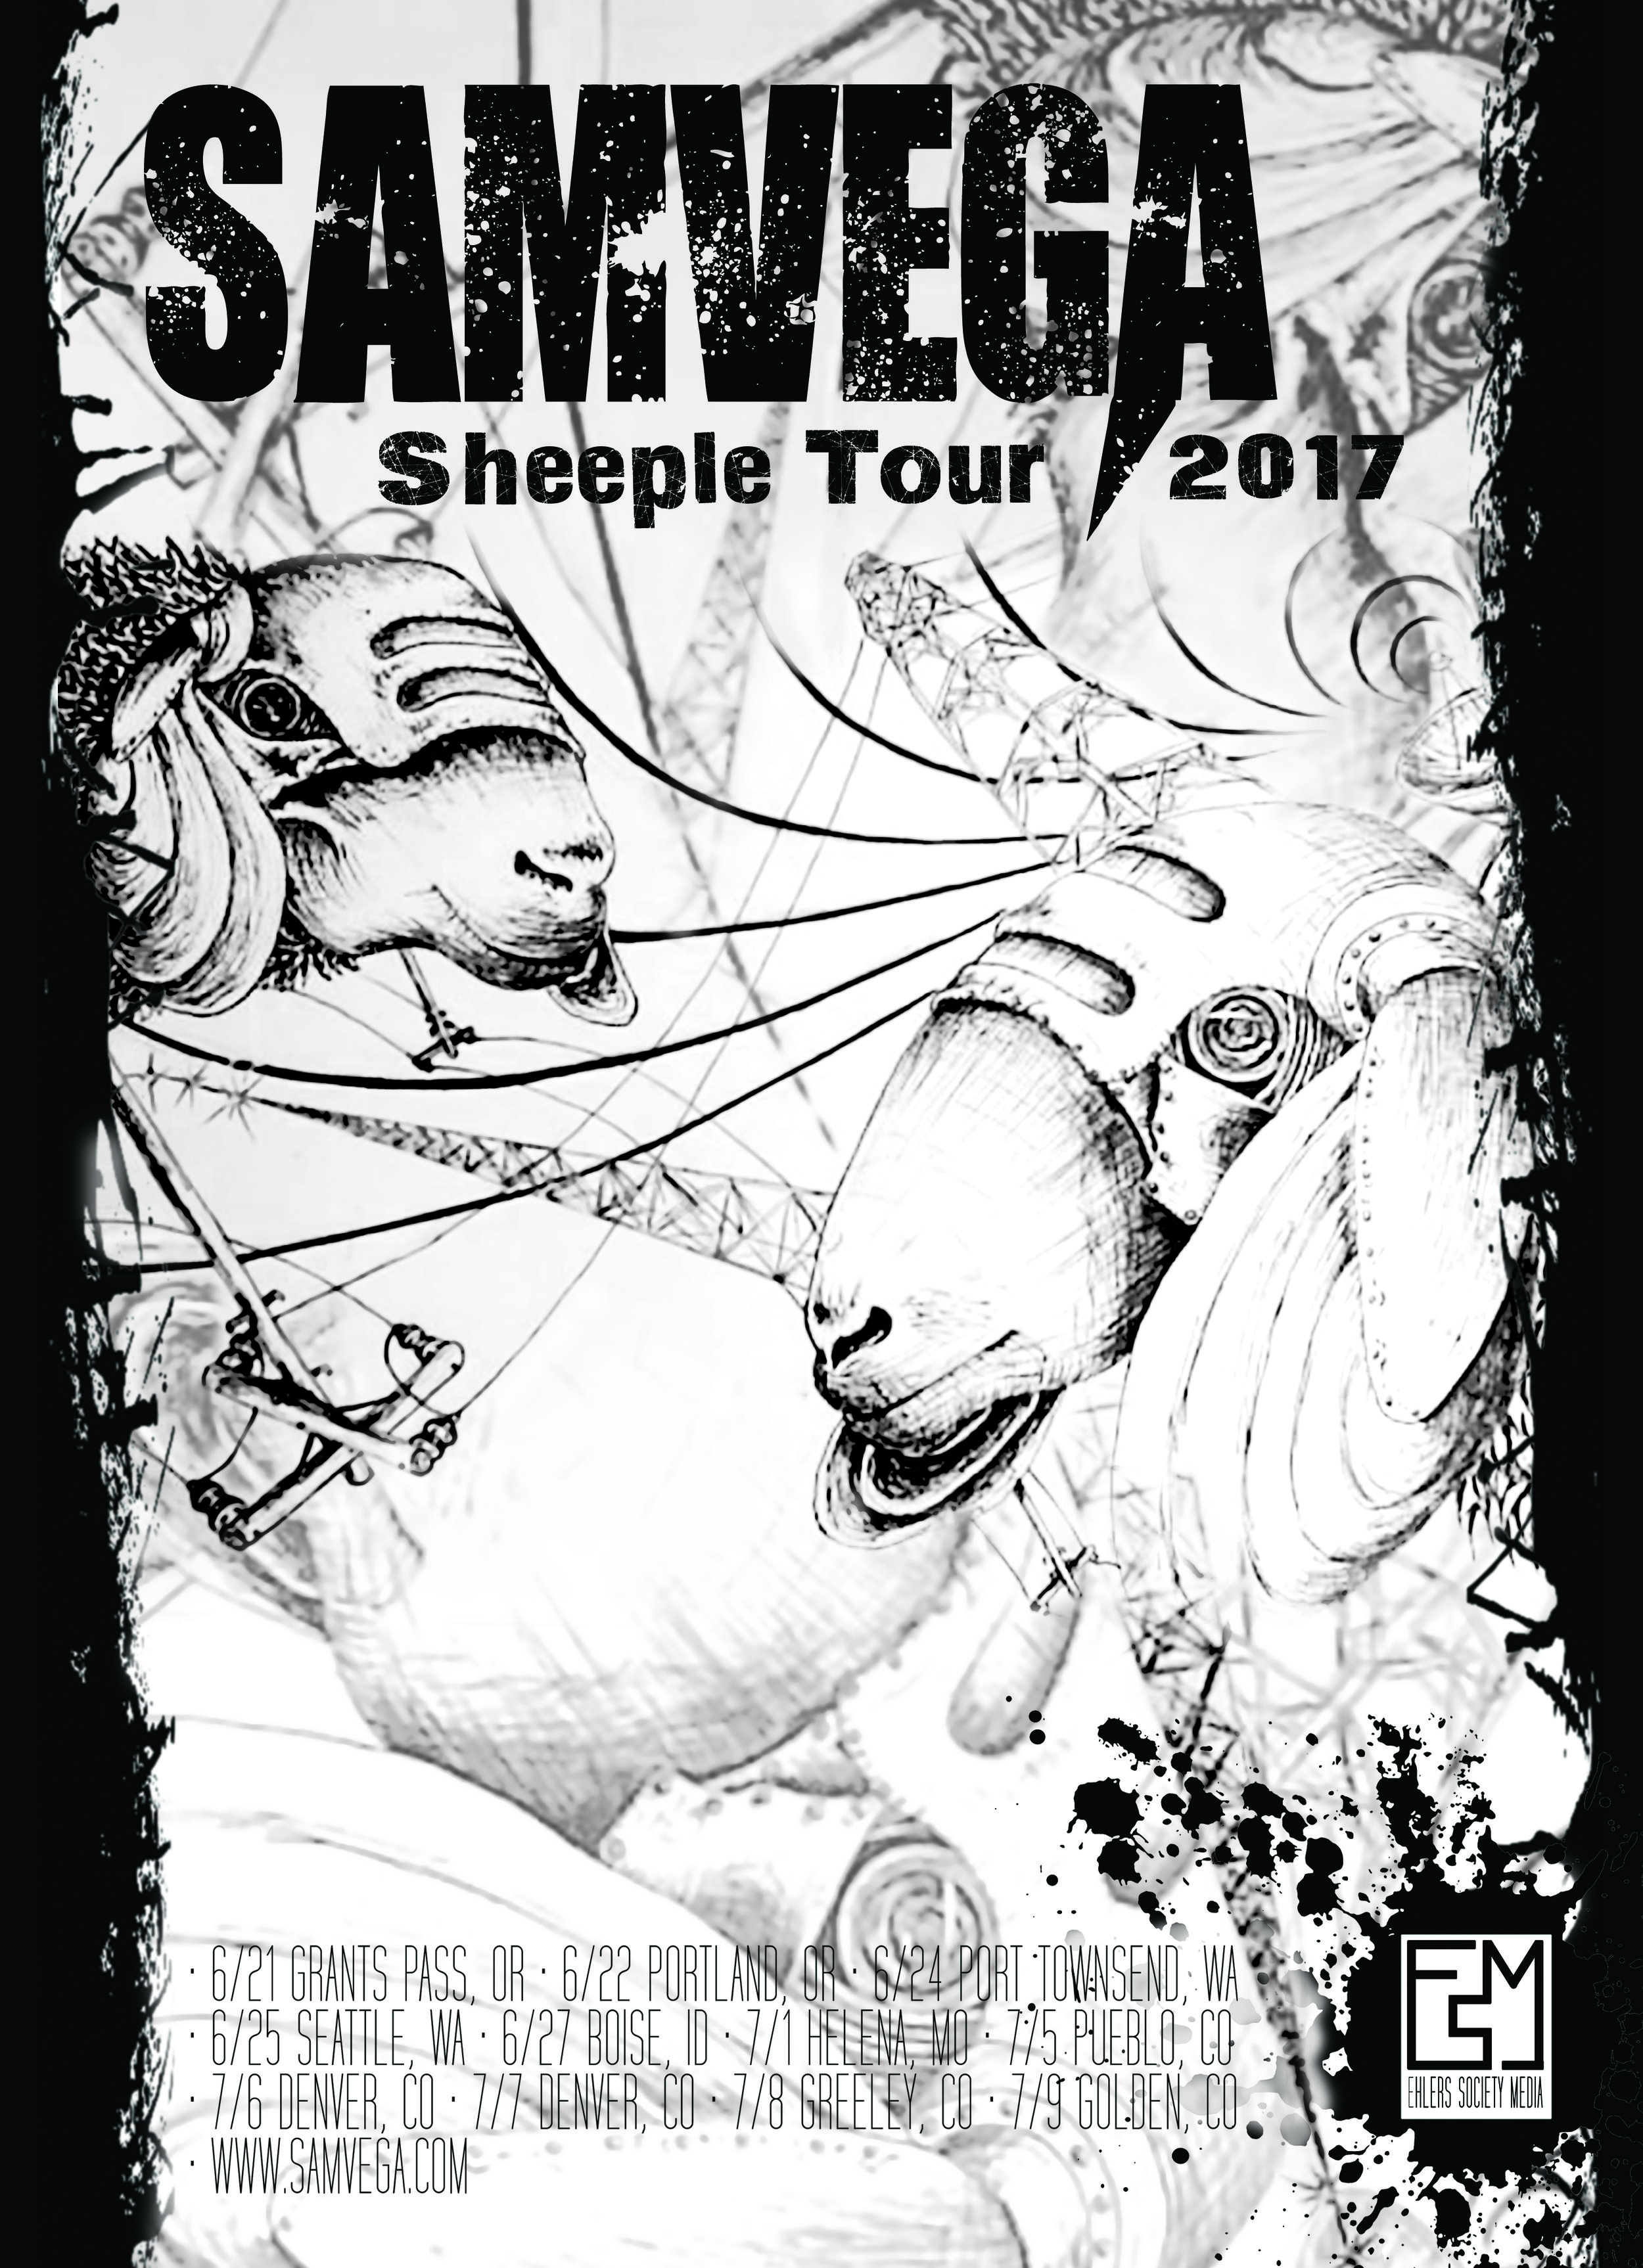 SV Poster Sheeple 2017 10x14 final.jpg